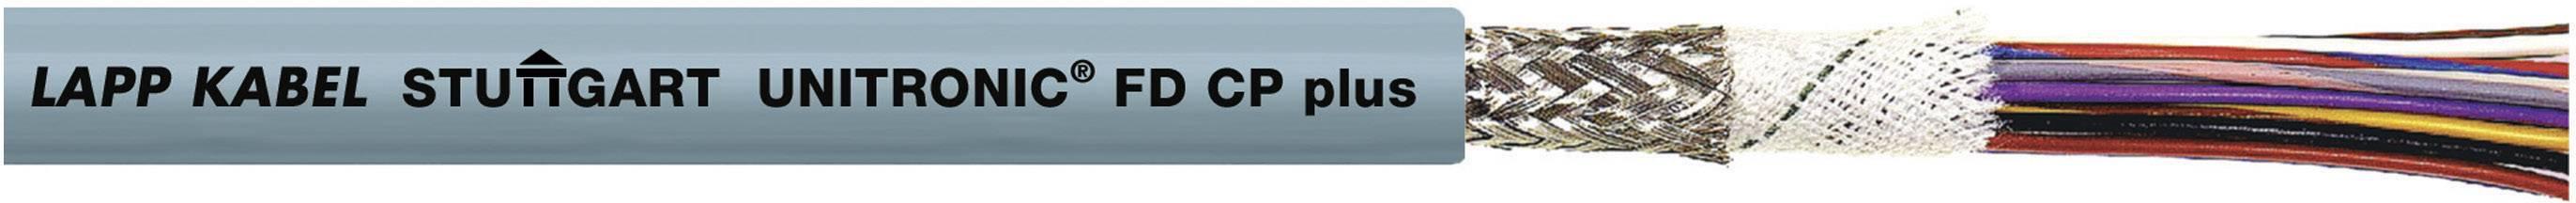 Datový kabel LappKabel UNITRONIC FD CP PLUS 4X0,25 (0028891), 4x 0,25 mm², 1 m, šedá